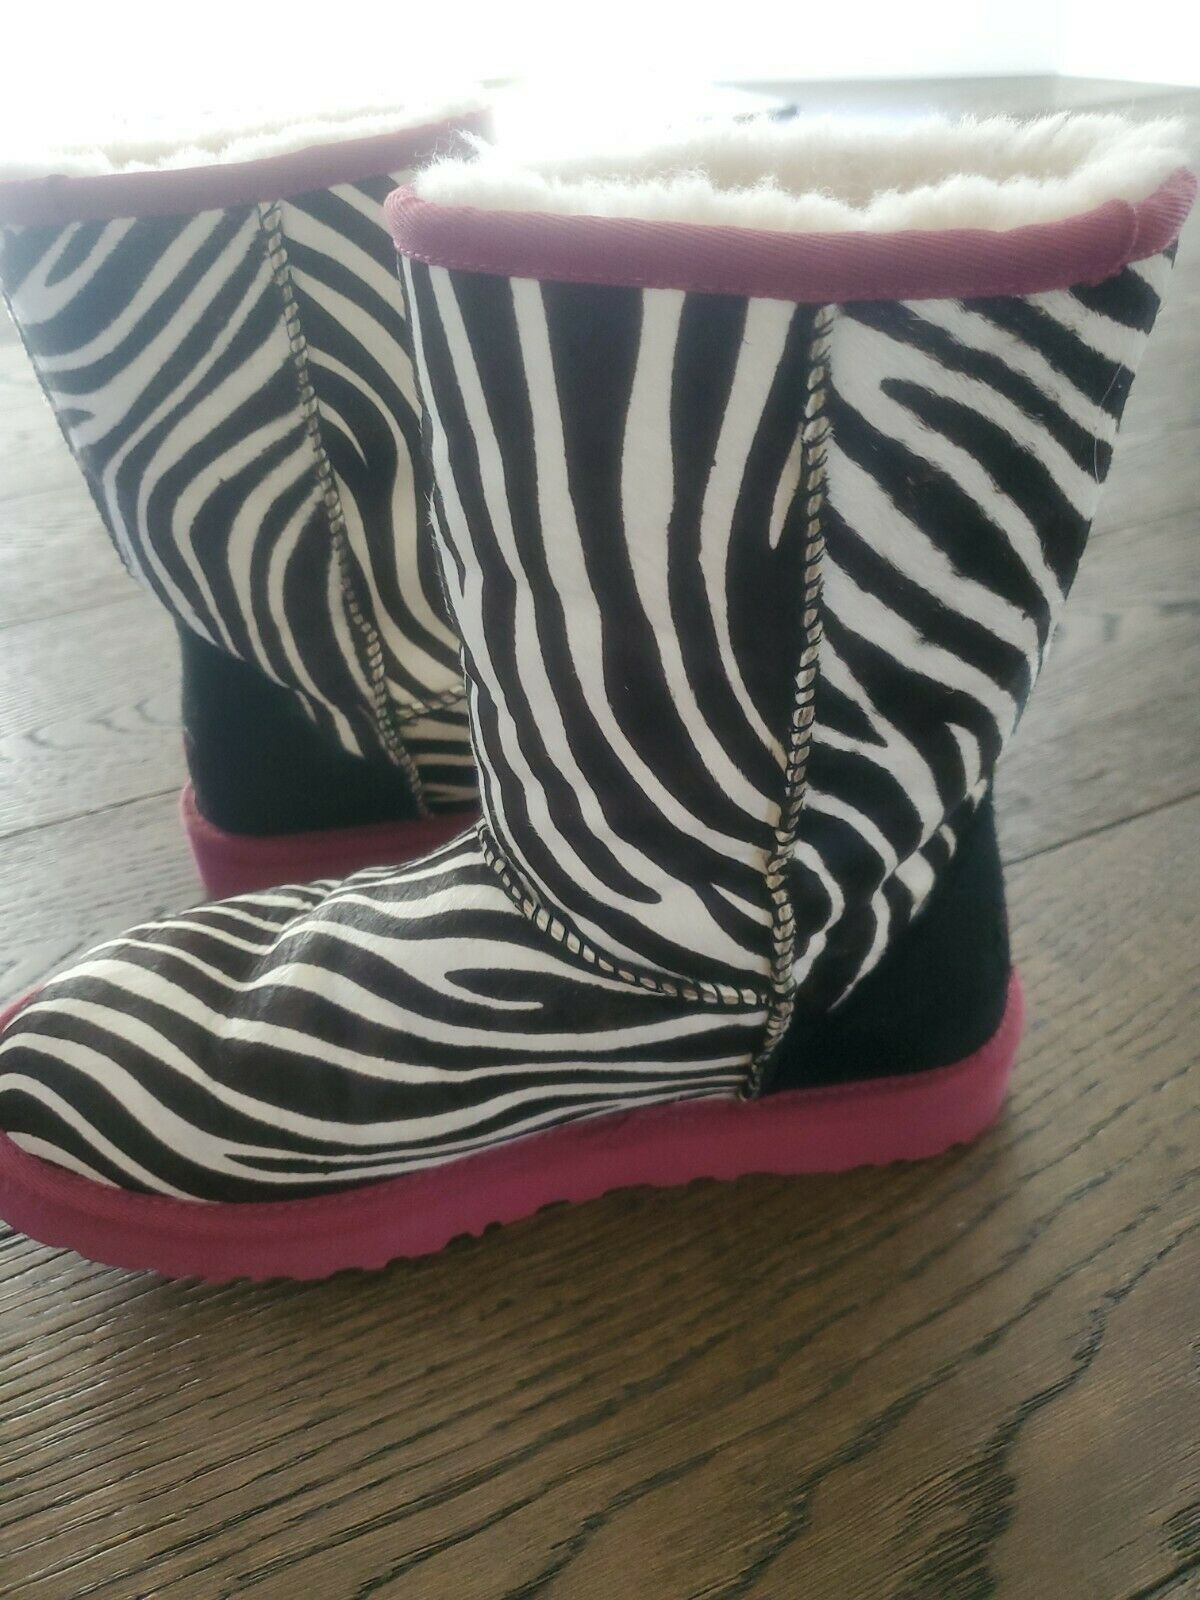 UGG Zebra Boots - image 5